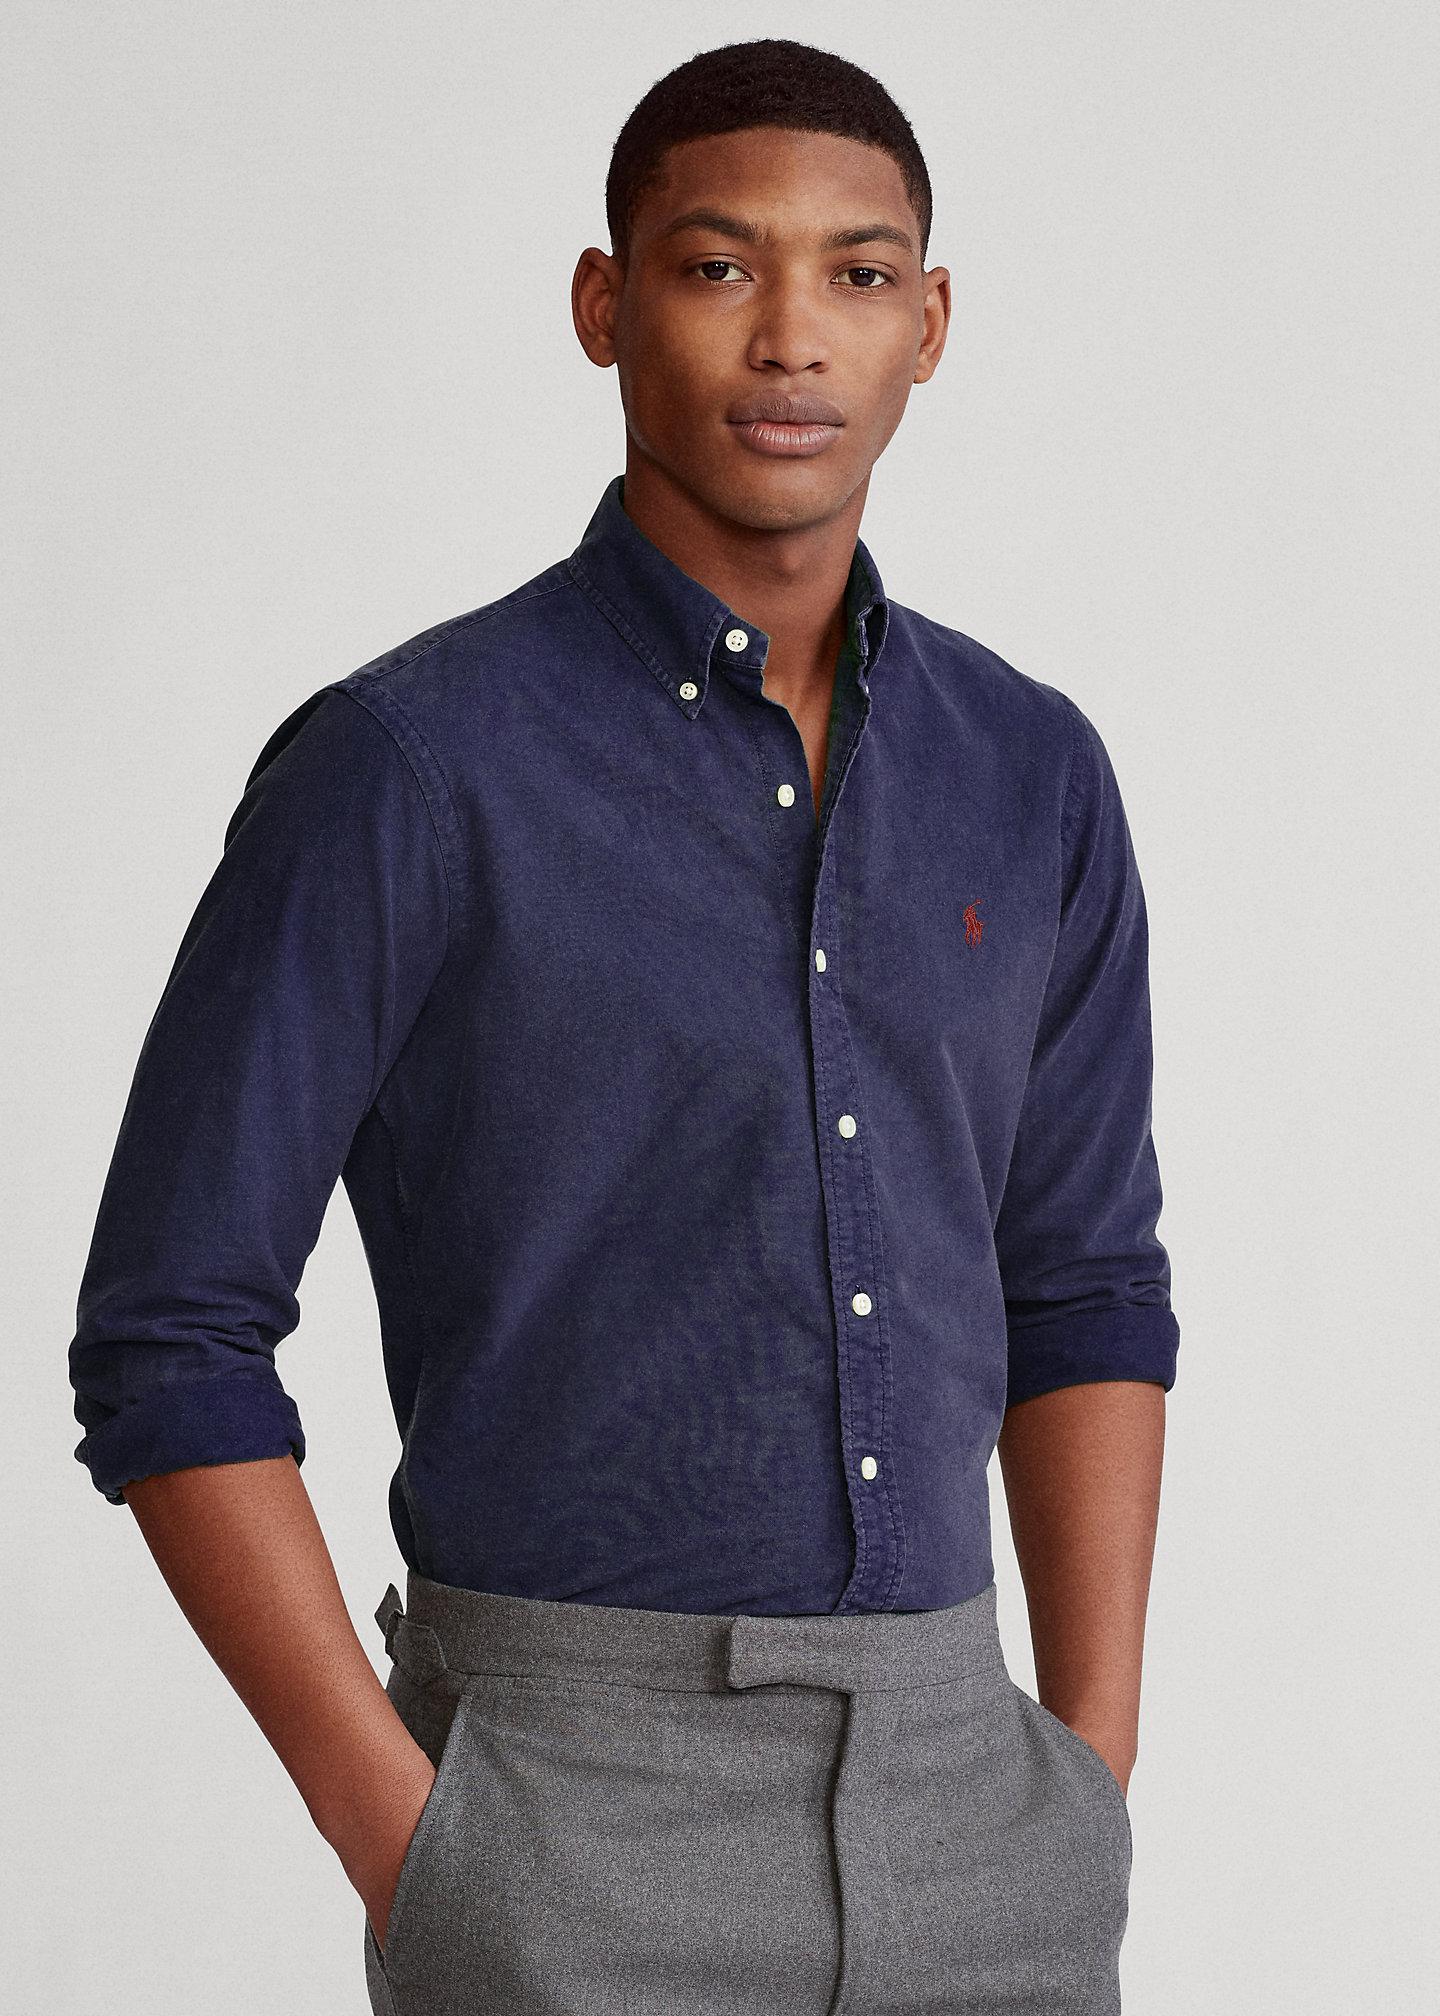 POLO RALPH LAUREN Garment-Dyed Oxford Shirt - All Fits